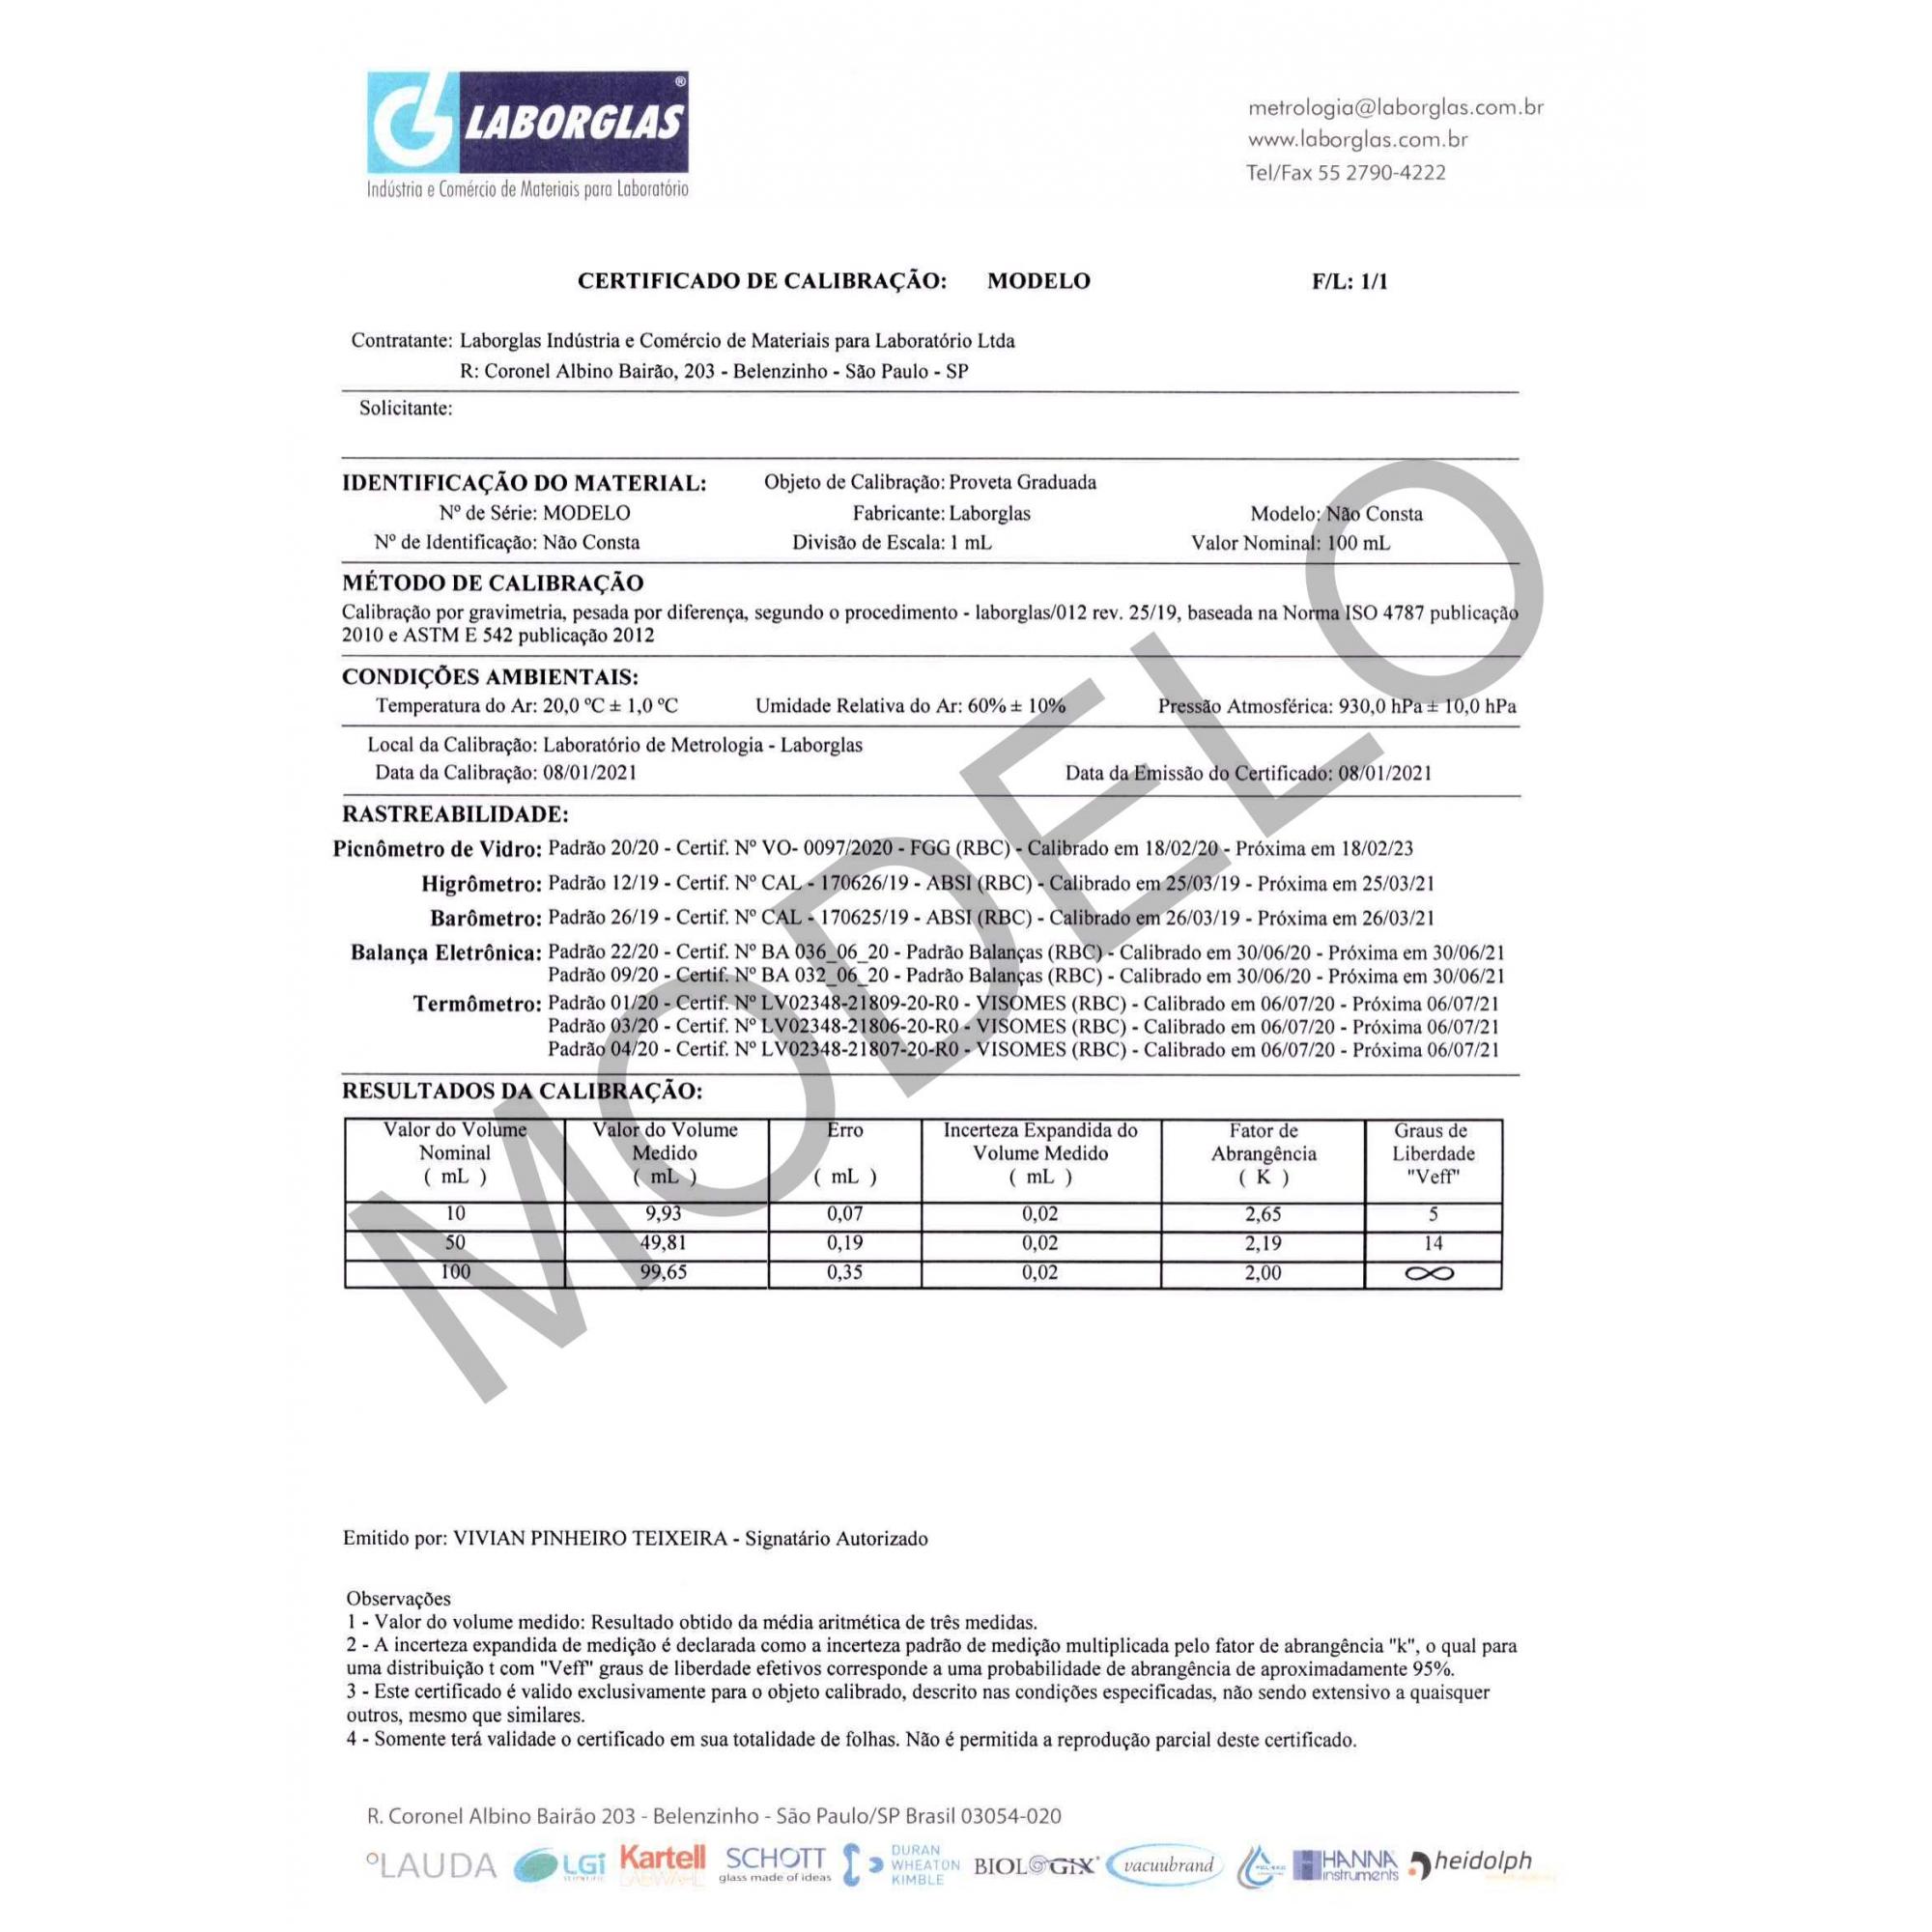 PROVETA GRADUADA BASE HEXAGONAL DE POLIPROPILENO 100 ML CLASSE A CERTIFICADO RASTREÁVEL - Laborglas - Cód. 9138724-C